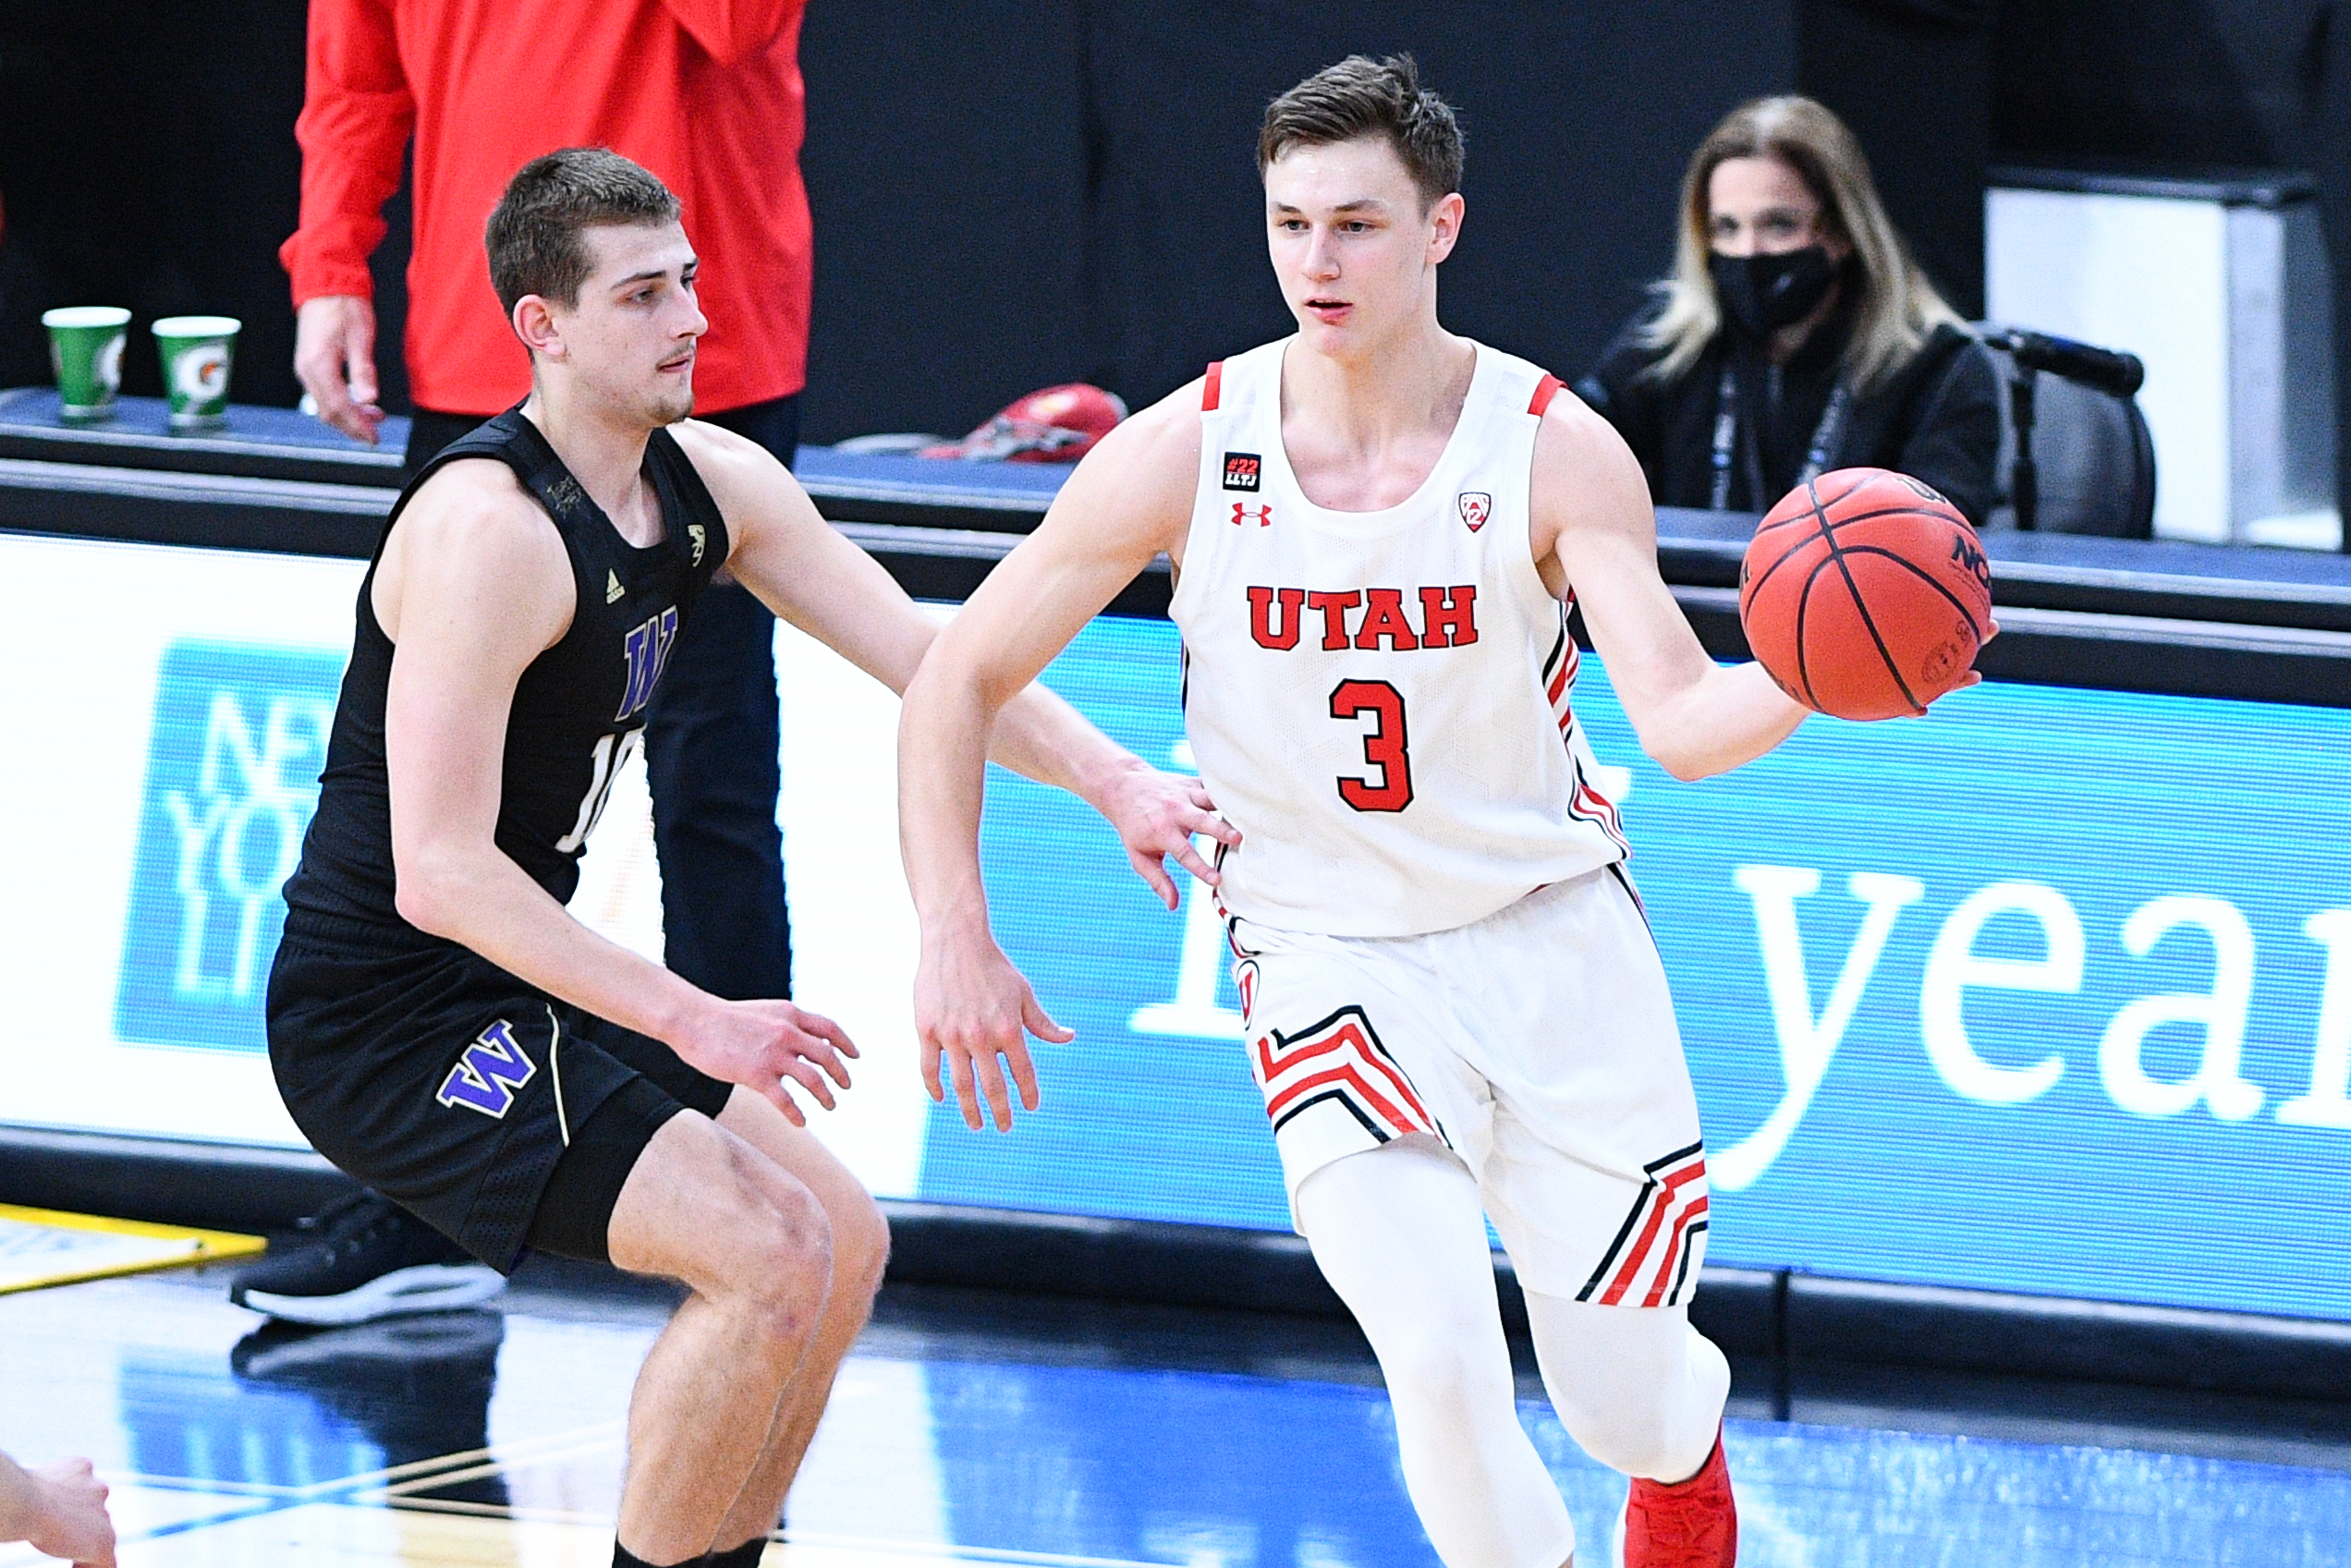 COLLEGE BASKETBALL: MAR 10 Pac-12 Tournament - Utah v Washington